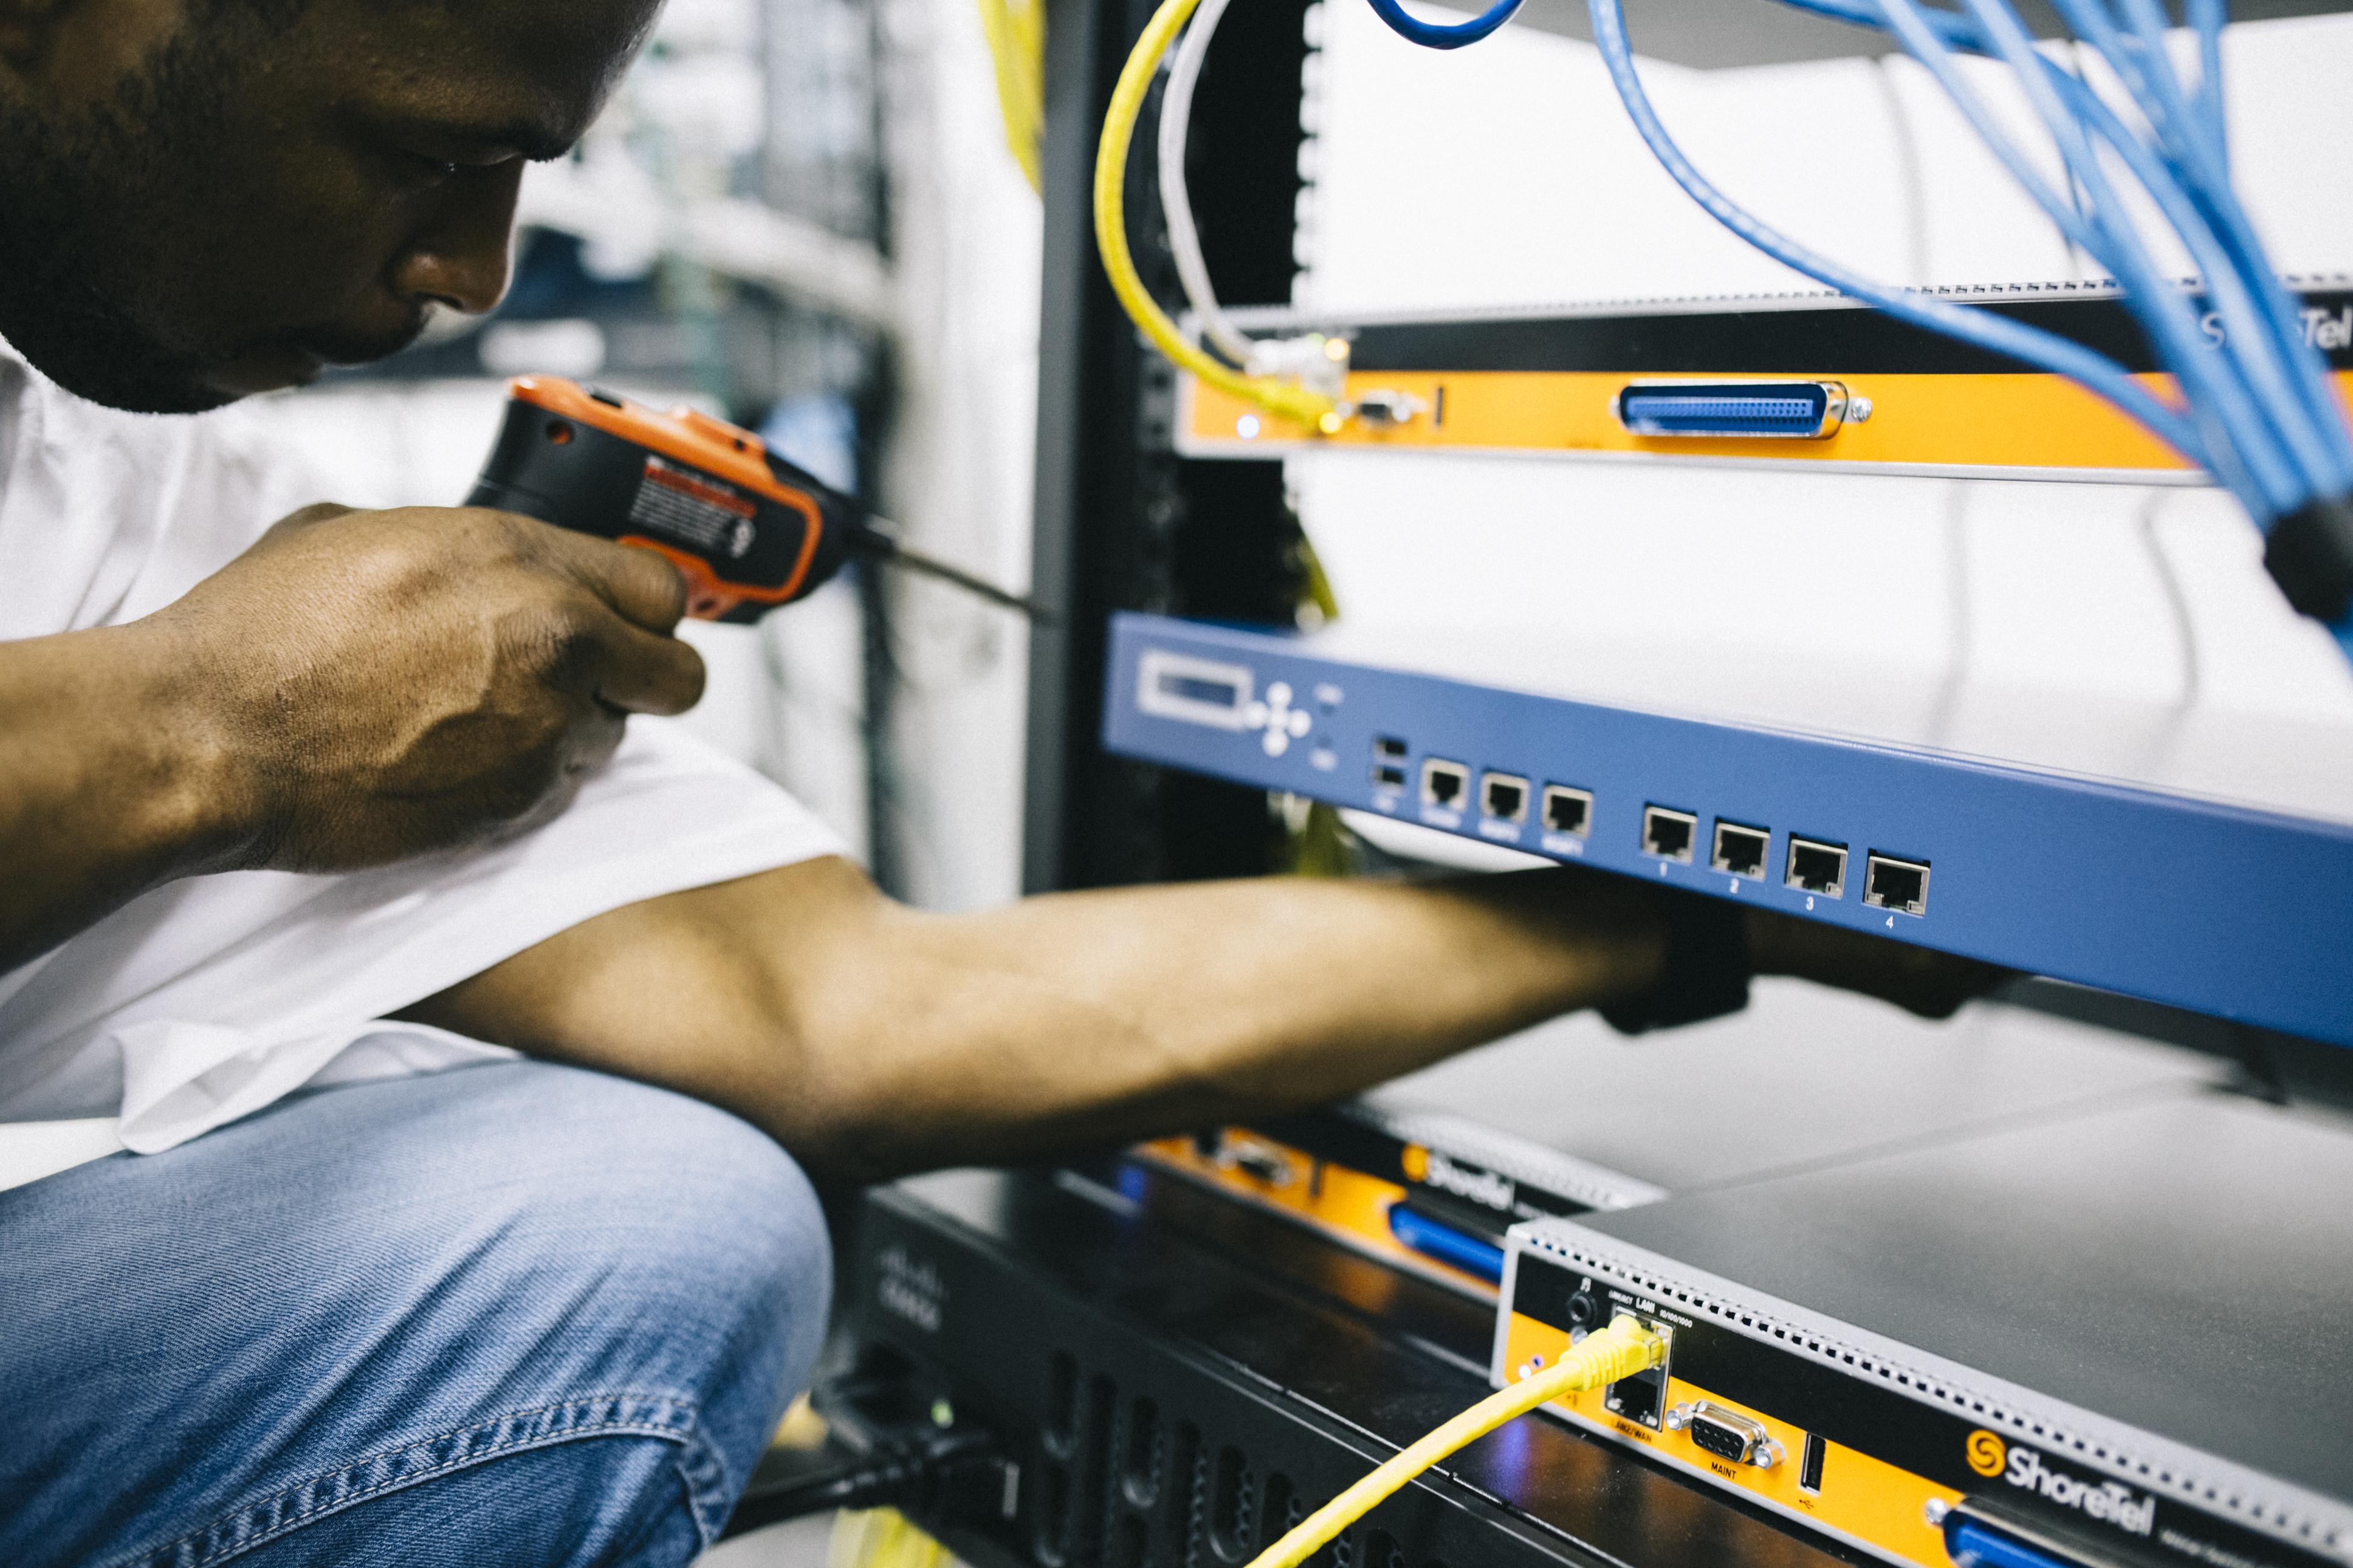 Telecommunications engineer photo